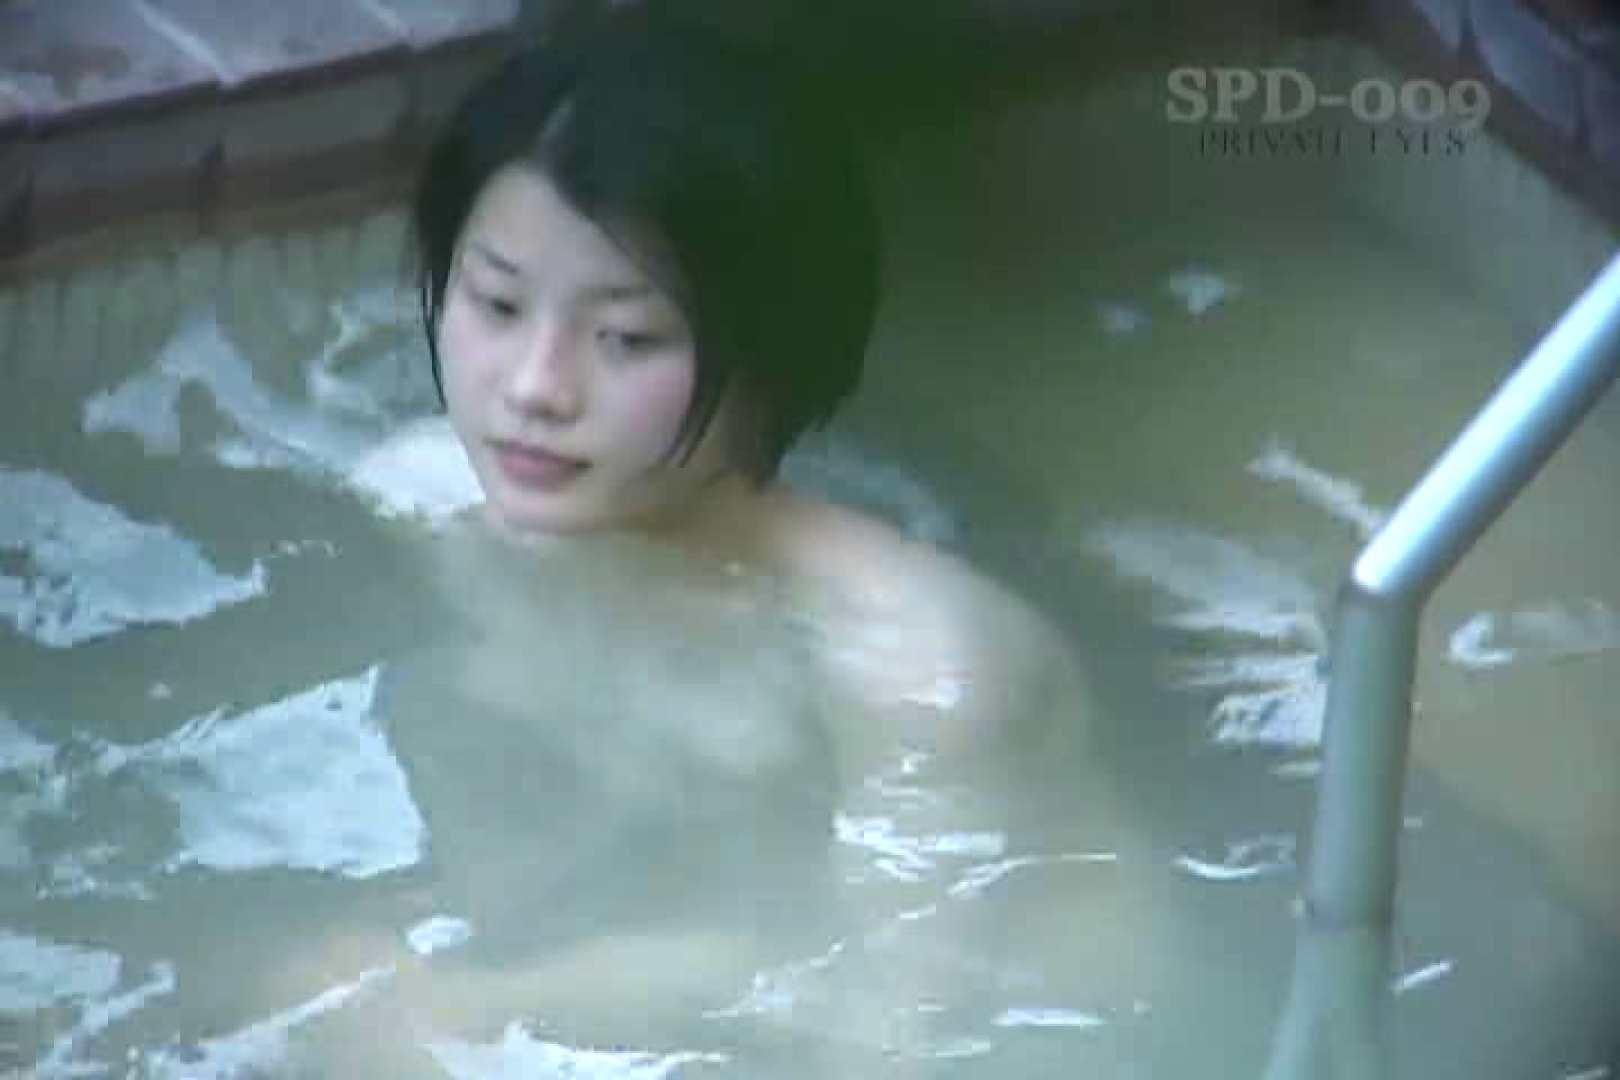 高画質版!SPD-009 新・露天浴場 2 高画質 隠し撮りAV無料 78画像 42